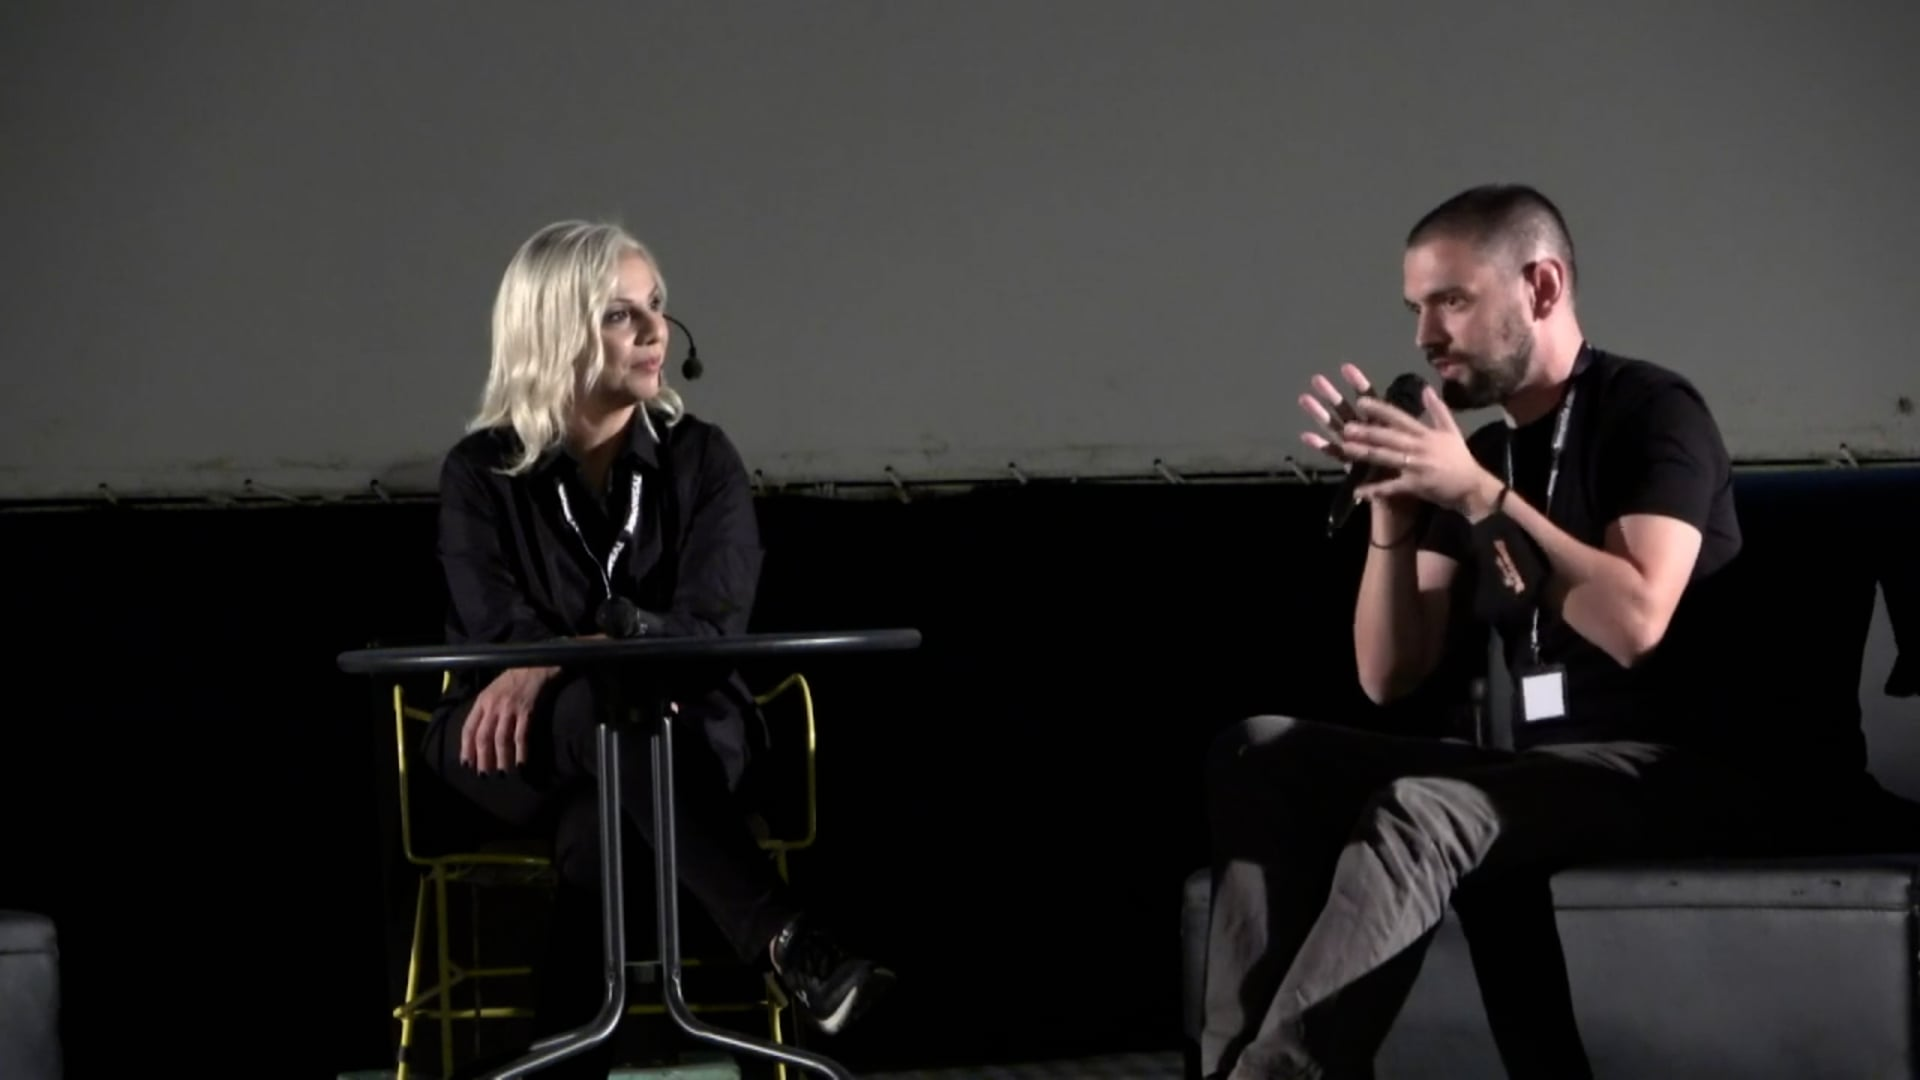 CINEMATHERAPY - DENISE NIKOLAKOU | FRI 17/9, 20:00